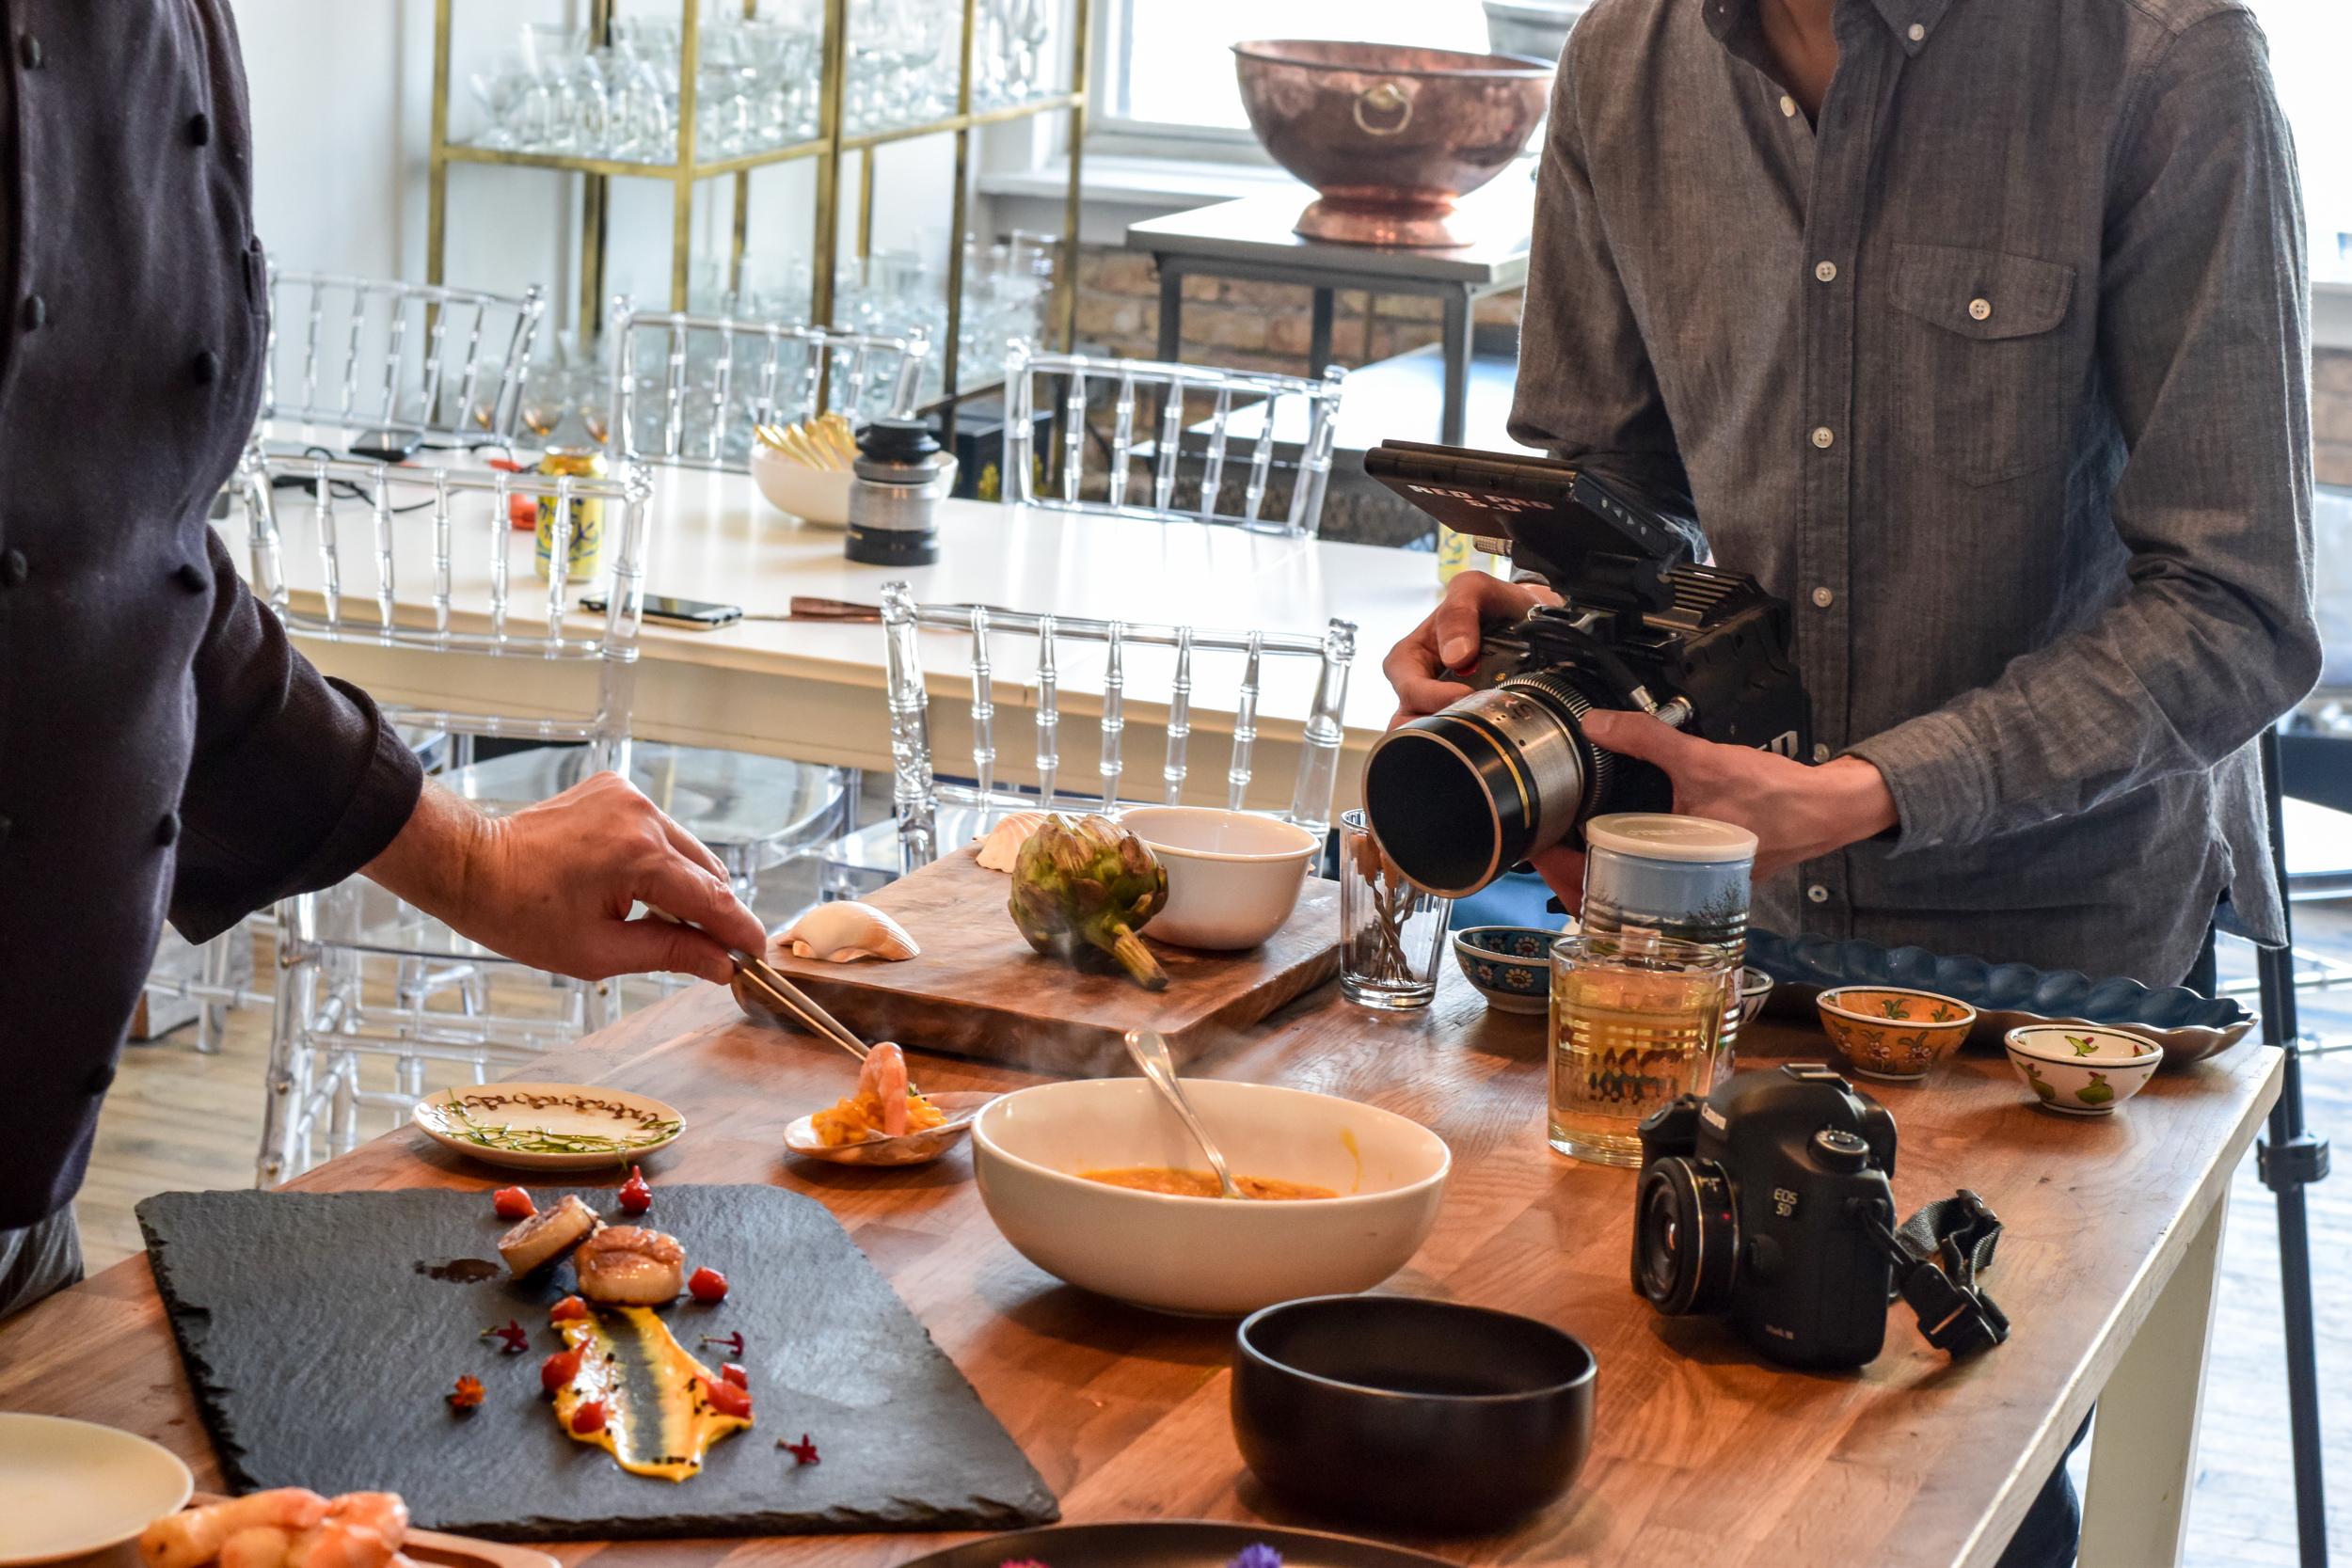 Eric Formato Formatografia photography Maura Gaughan Video Production Entreprenuership Charles Webb Chef Culinary Art -47.jpg